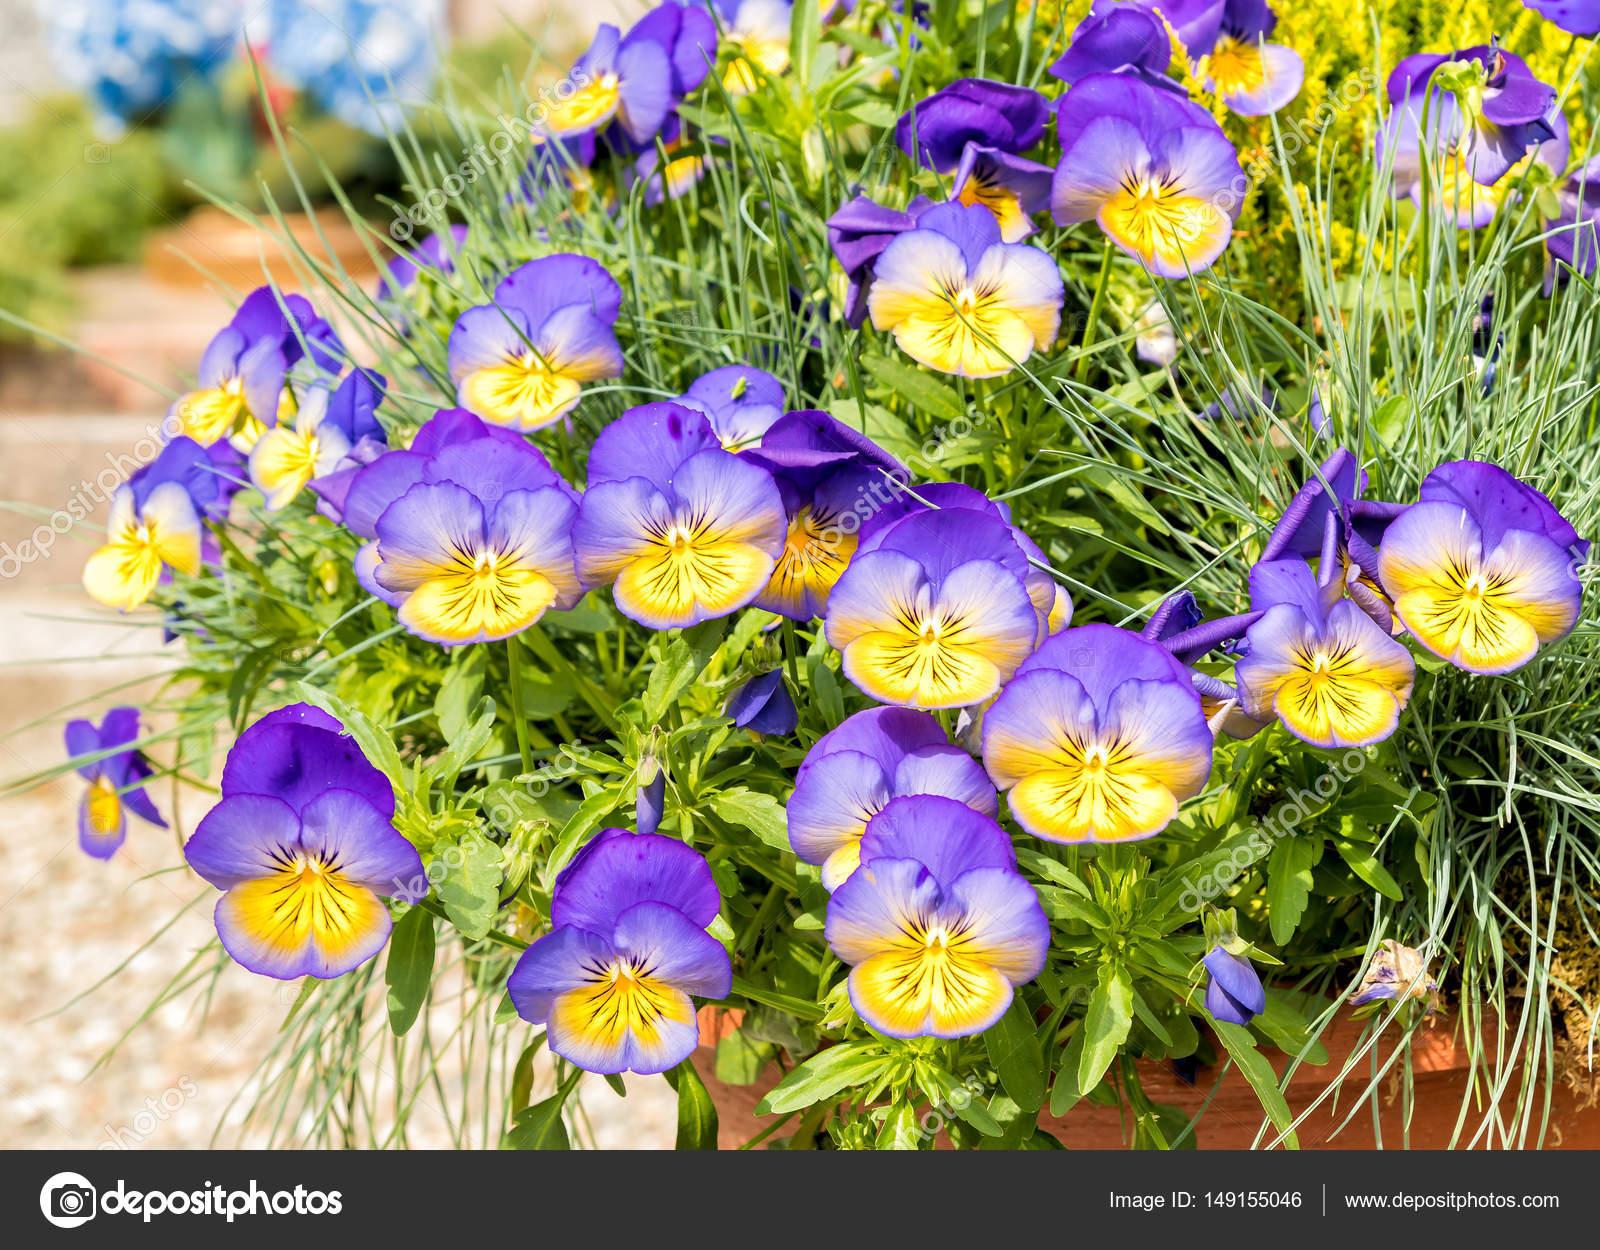 Purple And Yellow Pansy Flowers Stock Photo Elesi 149155046